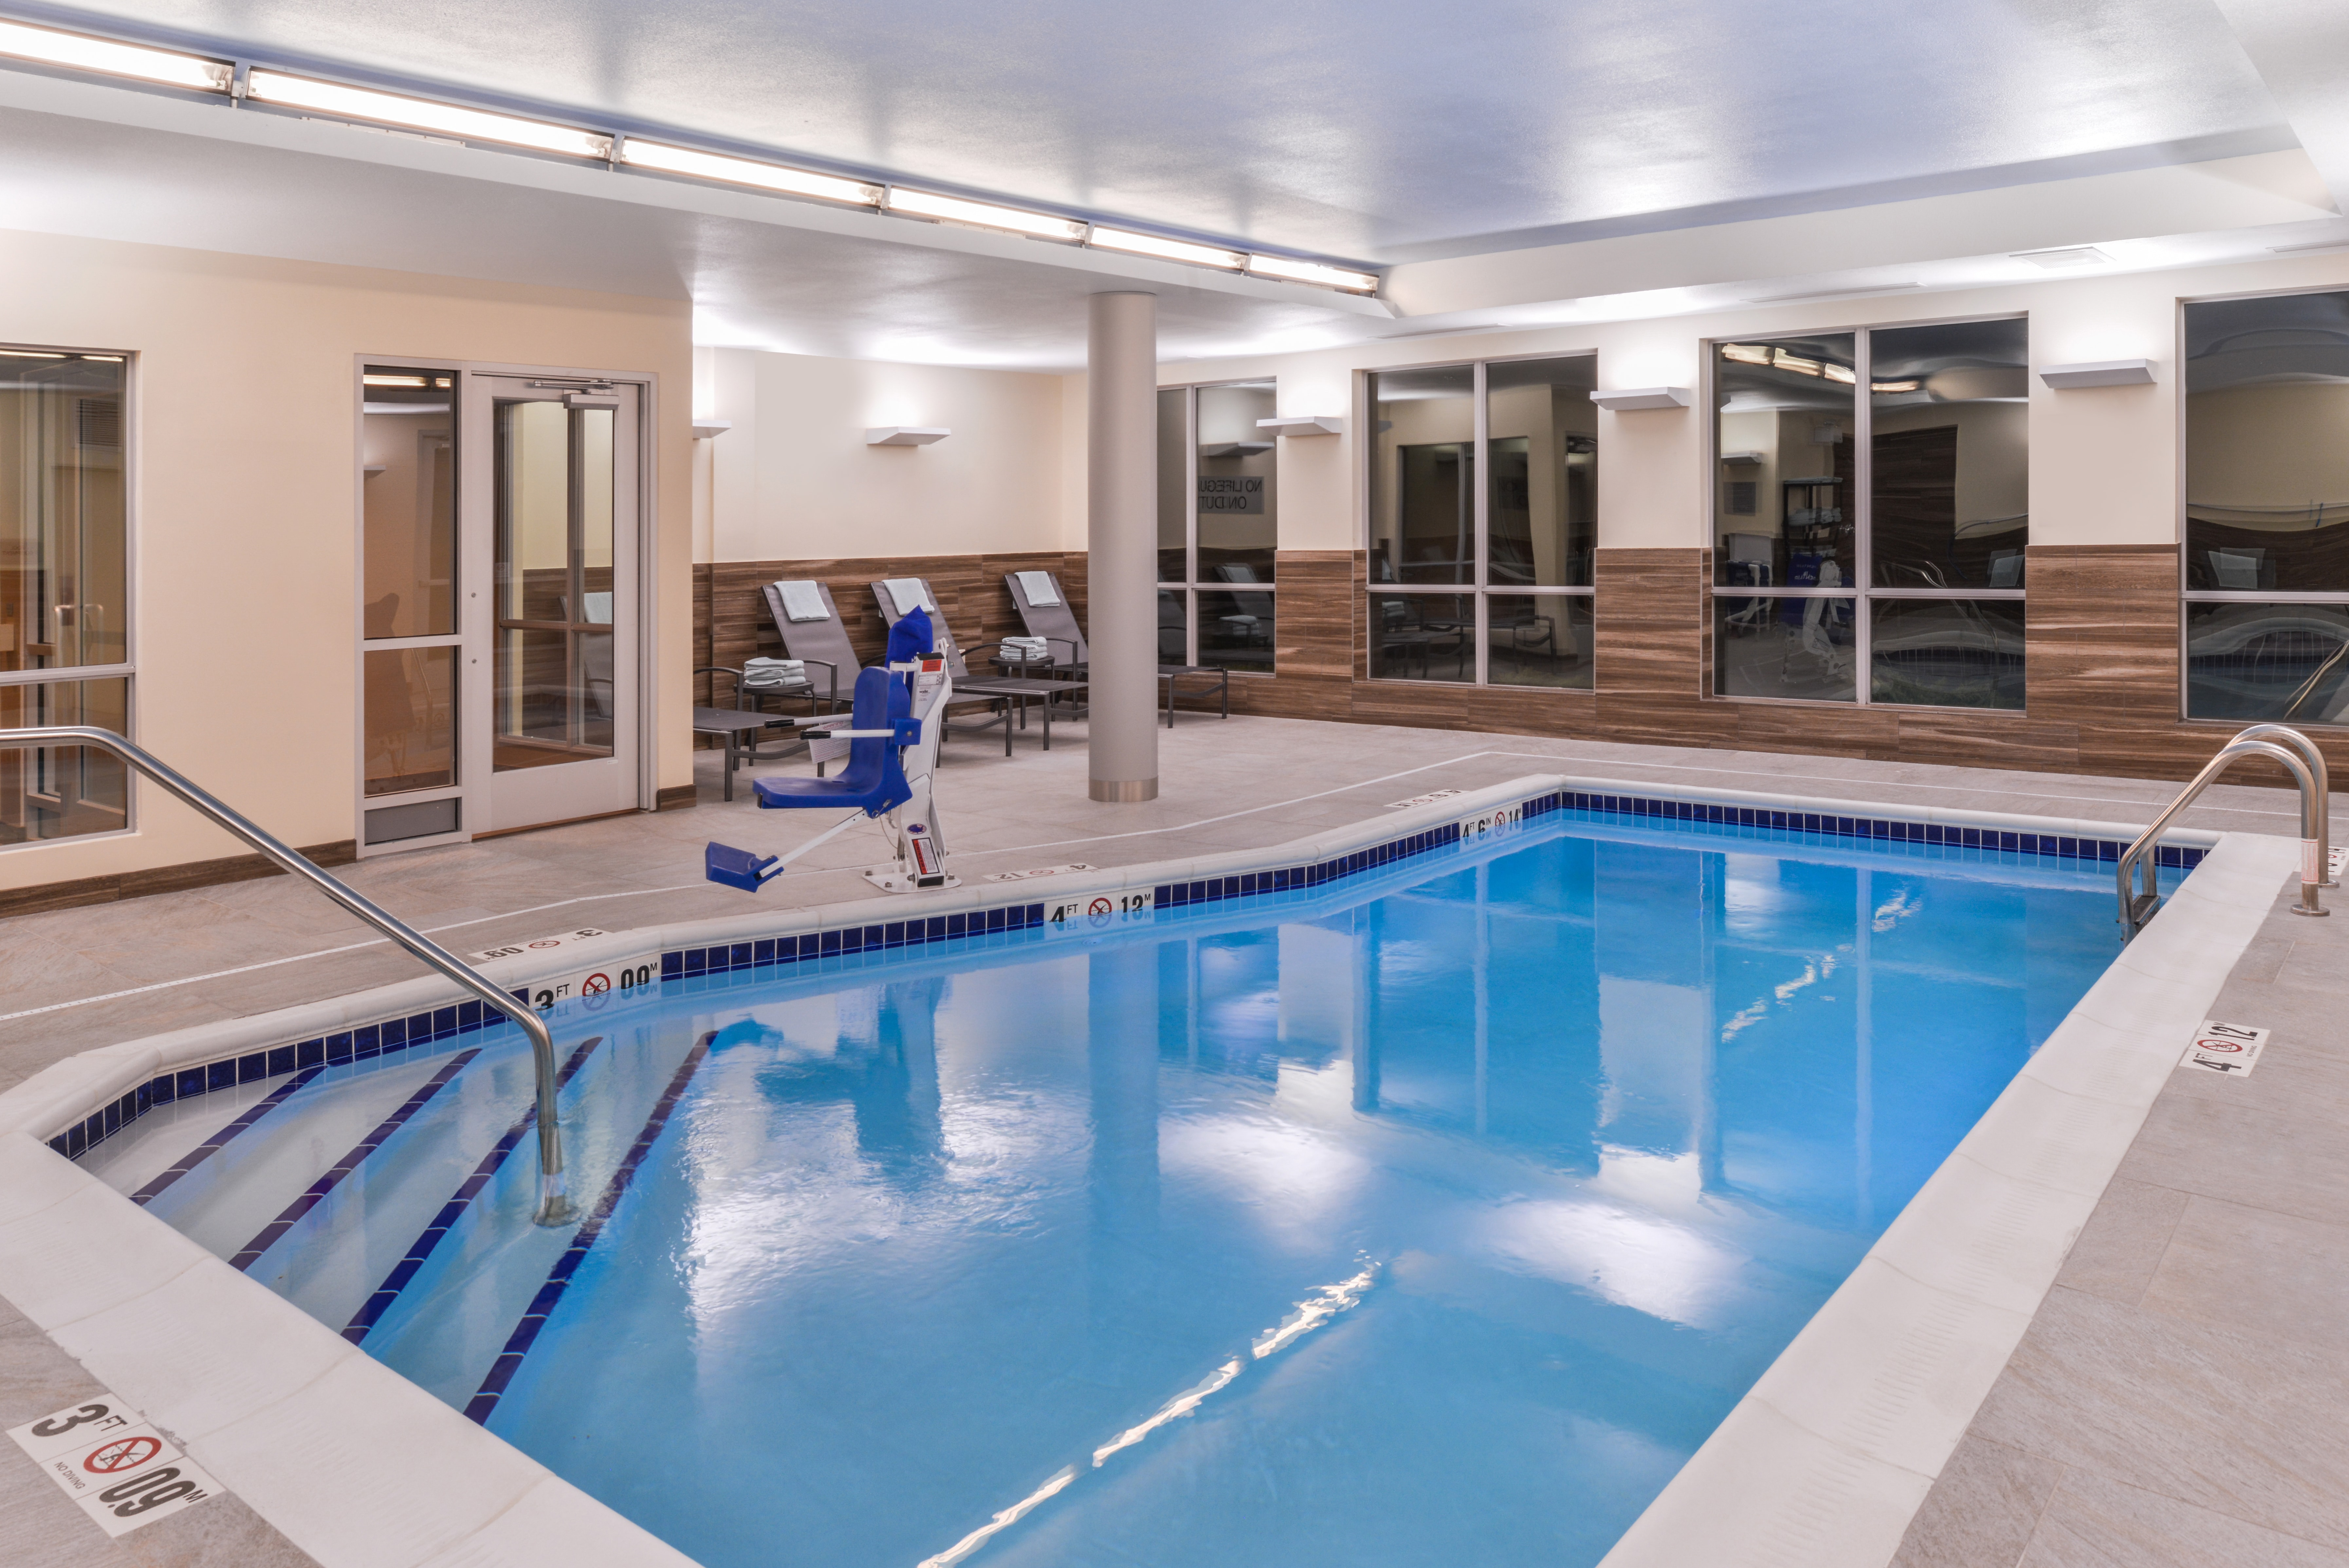 https://www.hotelsbyday.com/_data/default-hotel_image/3/16101/fis-cidco-pool2.jpg